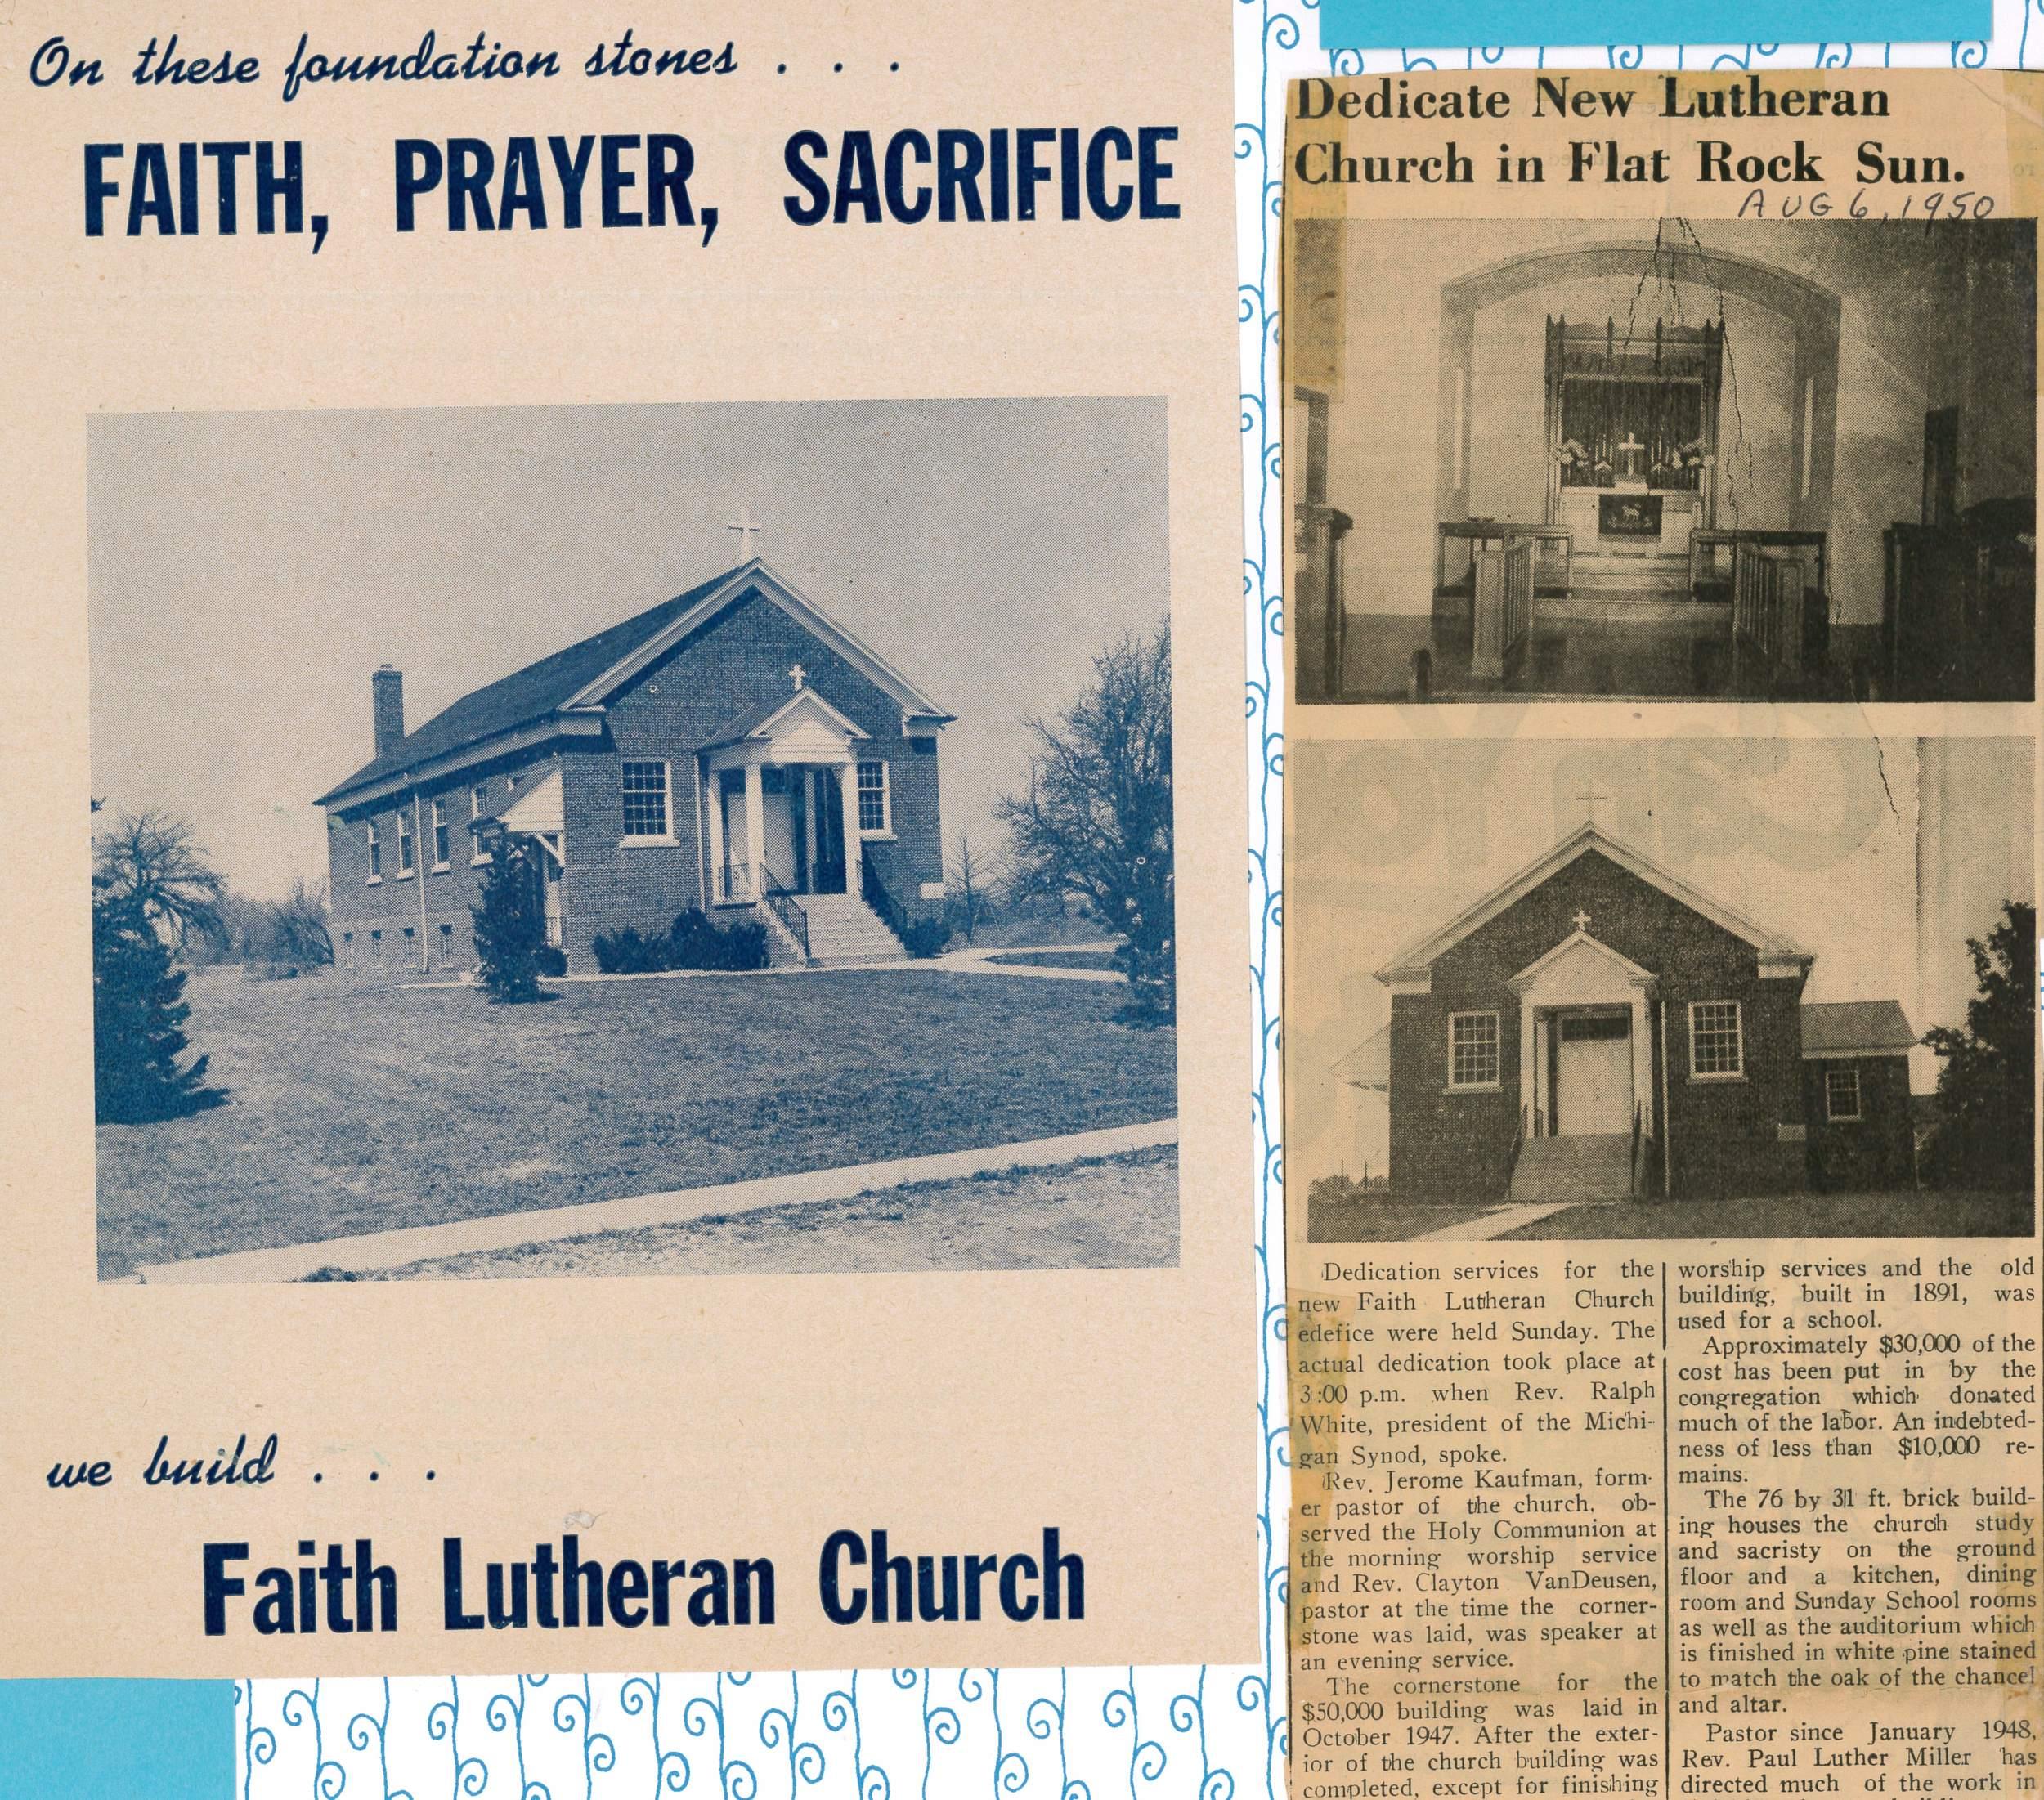 1950 Church building dedication